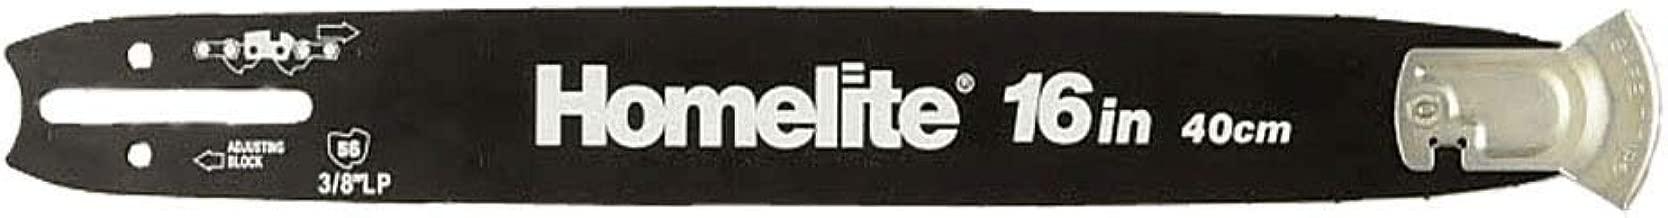 Best homelite ut10560 chainsaw Reviews